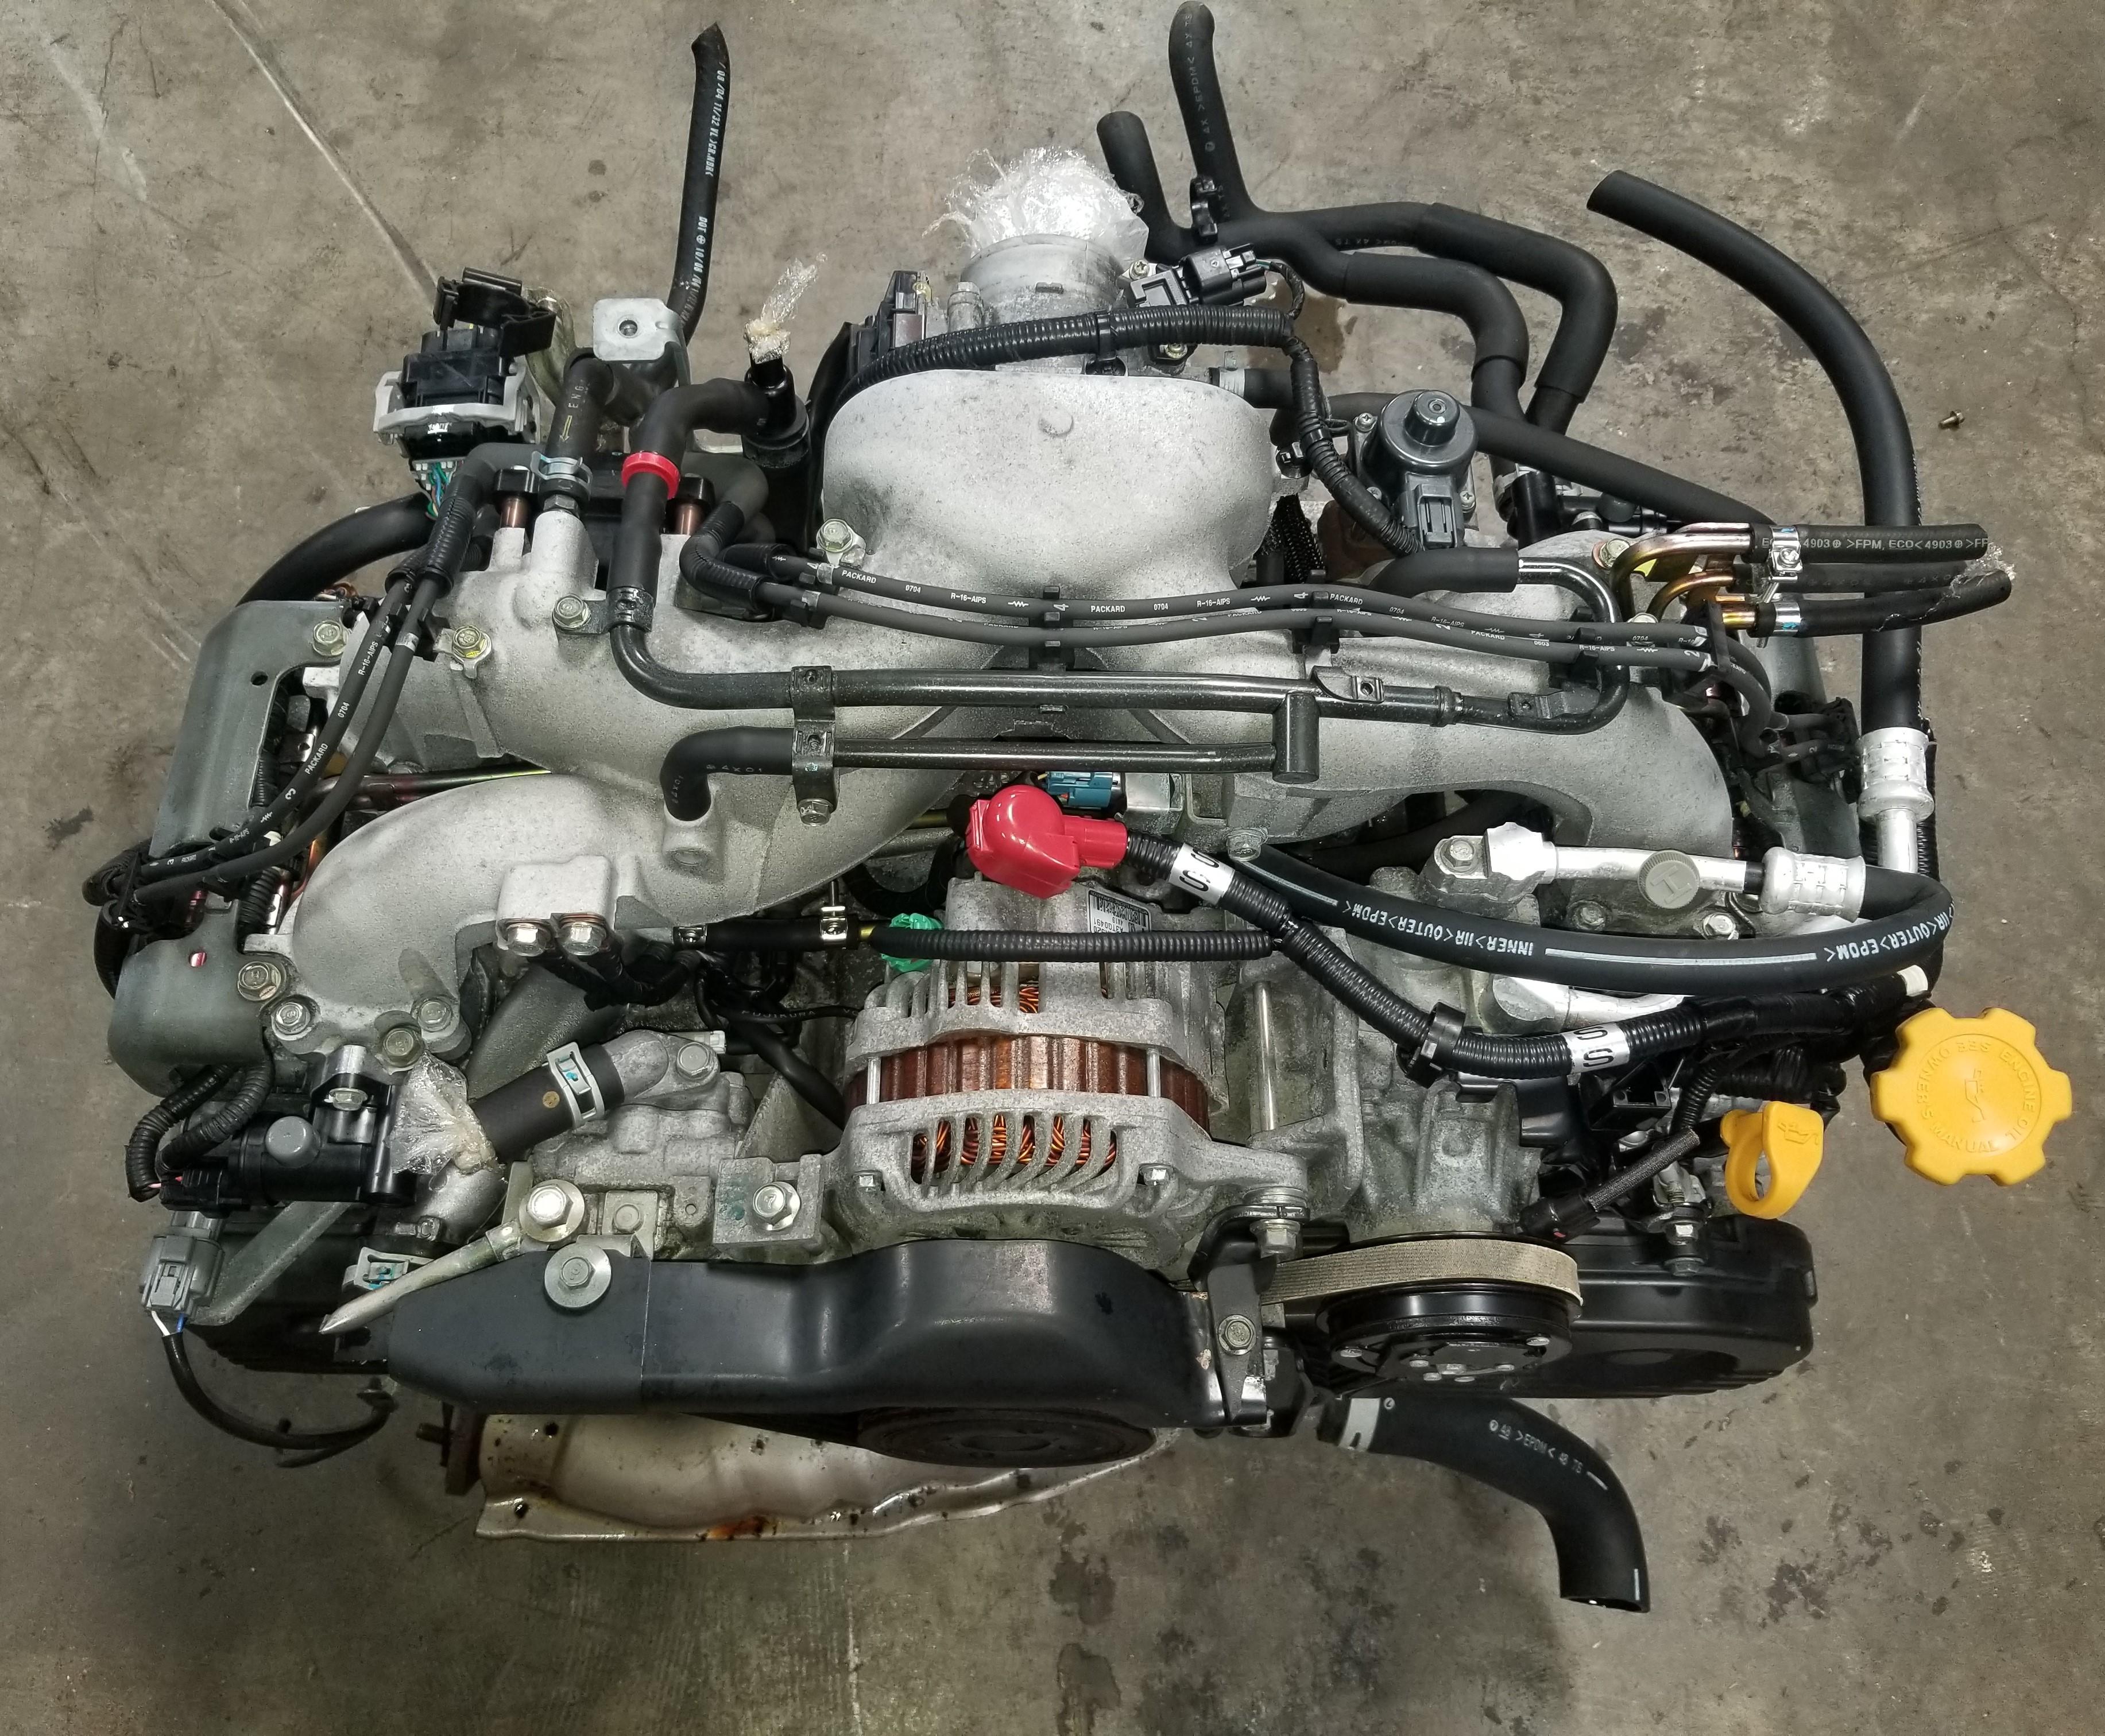 EJ25 2000 2005 SUBARU FORESTER LEGACY OUTBACK IMPREZA RS 2 5L SOHC ENGINE  JDM EJ25